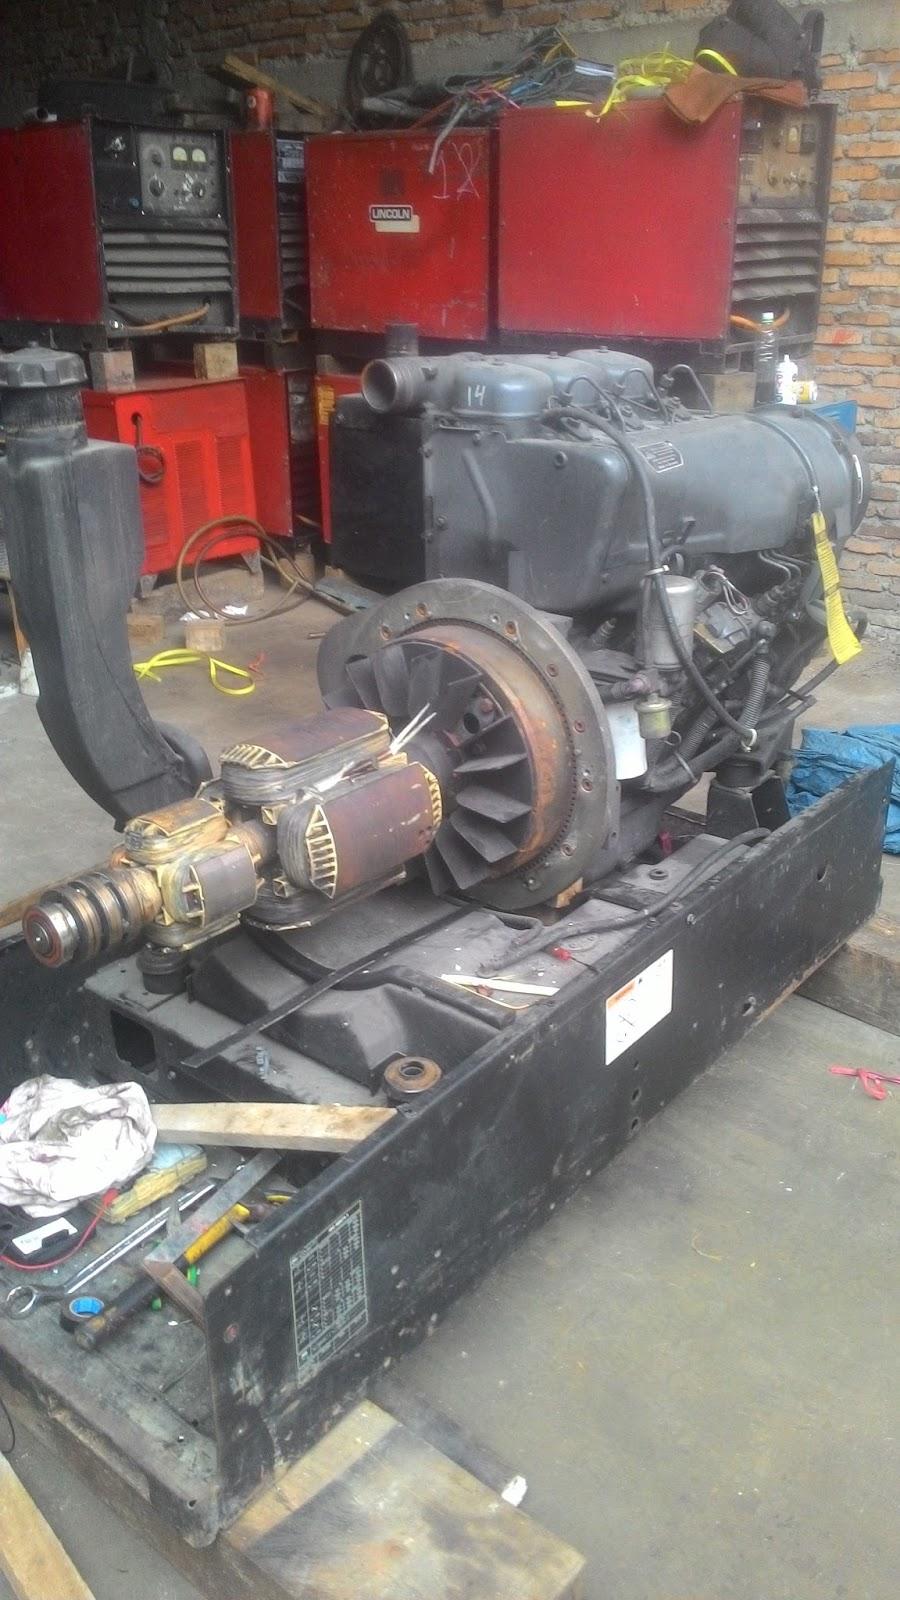 Sewa mesin las welding engine 600 ampere engine miller - Webaccess leroymerlin fr ...